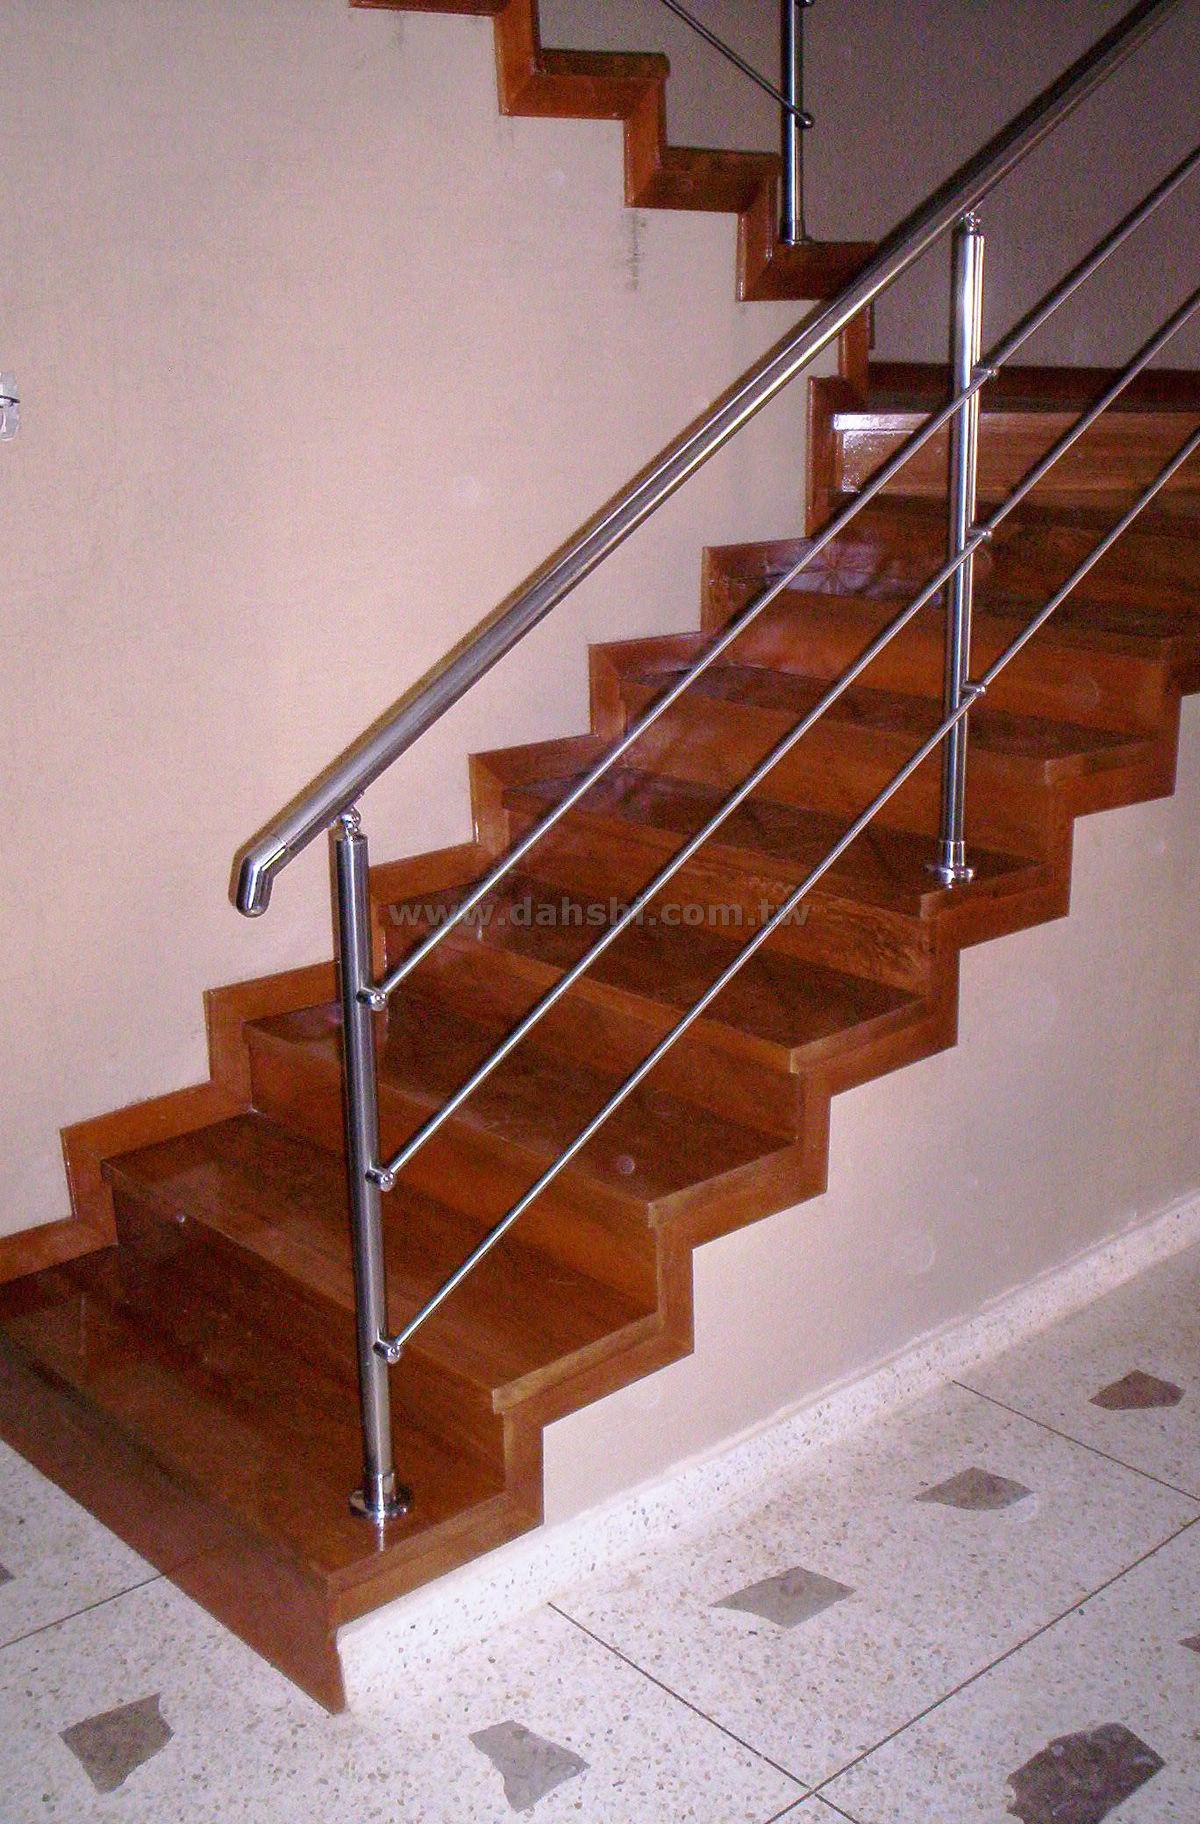 Handrail and Balusters Story for Angel Urdaneta